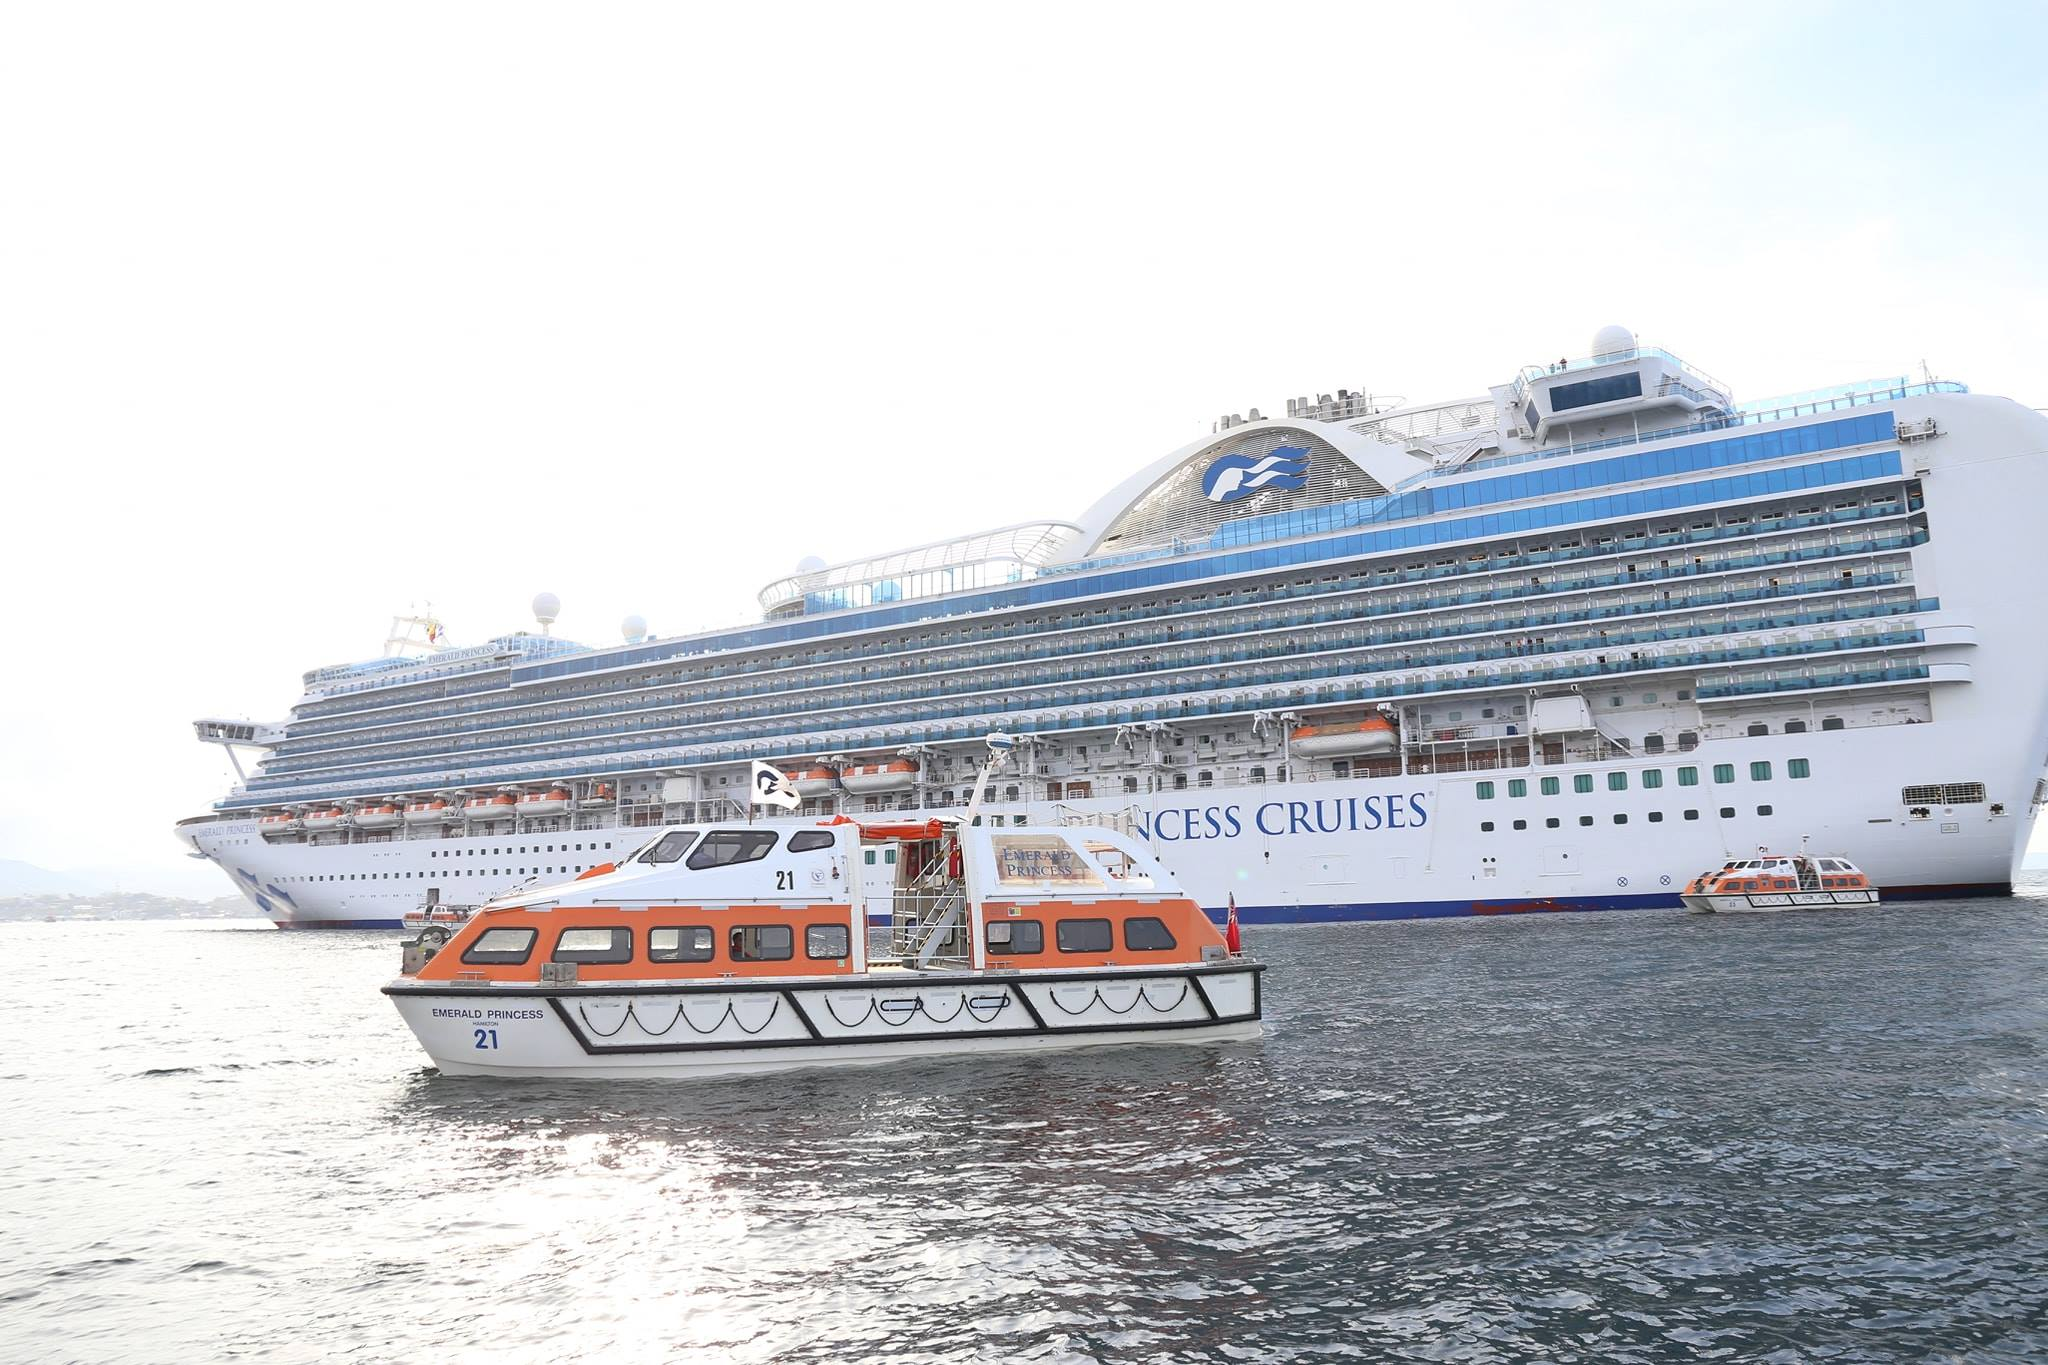 Princess Cruises Nicaragua